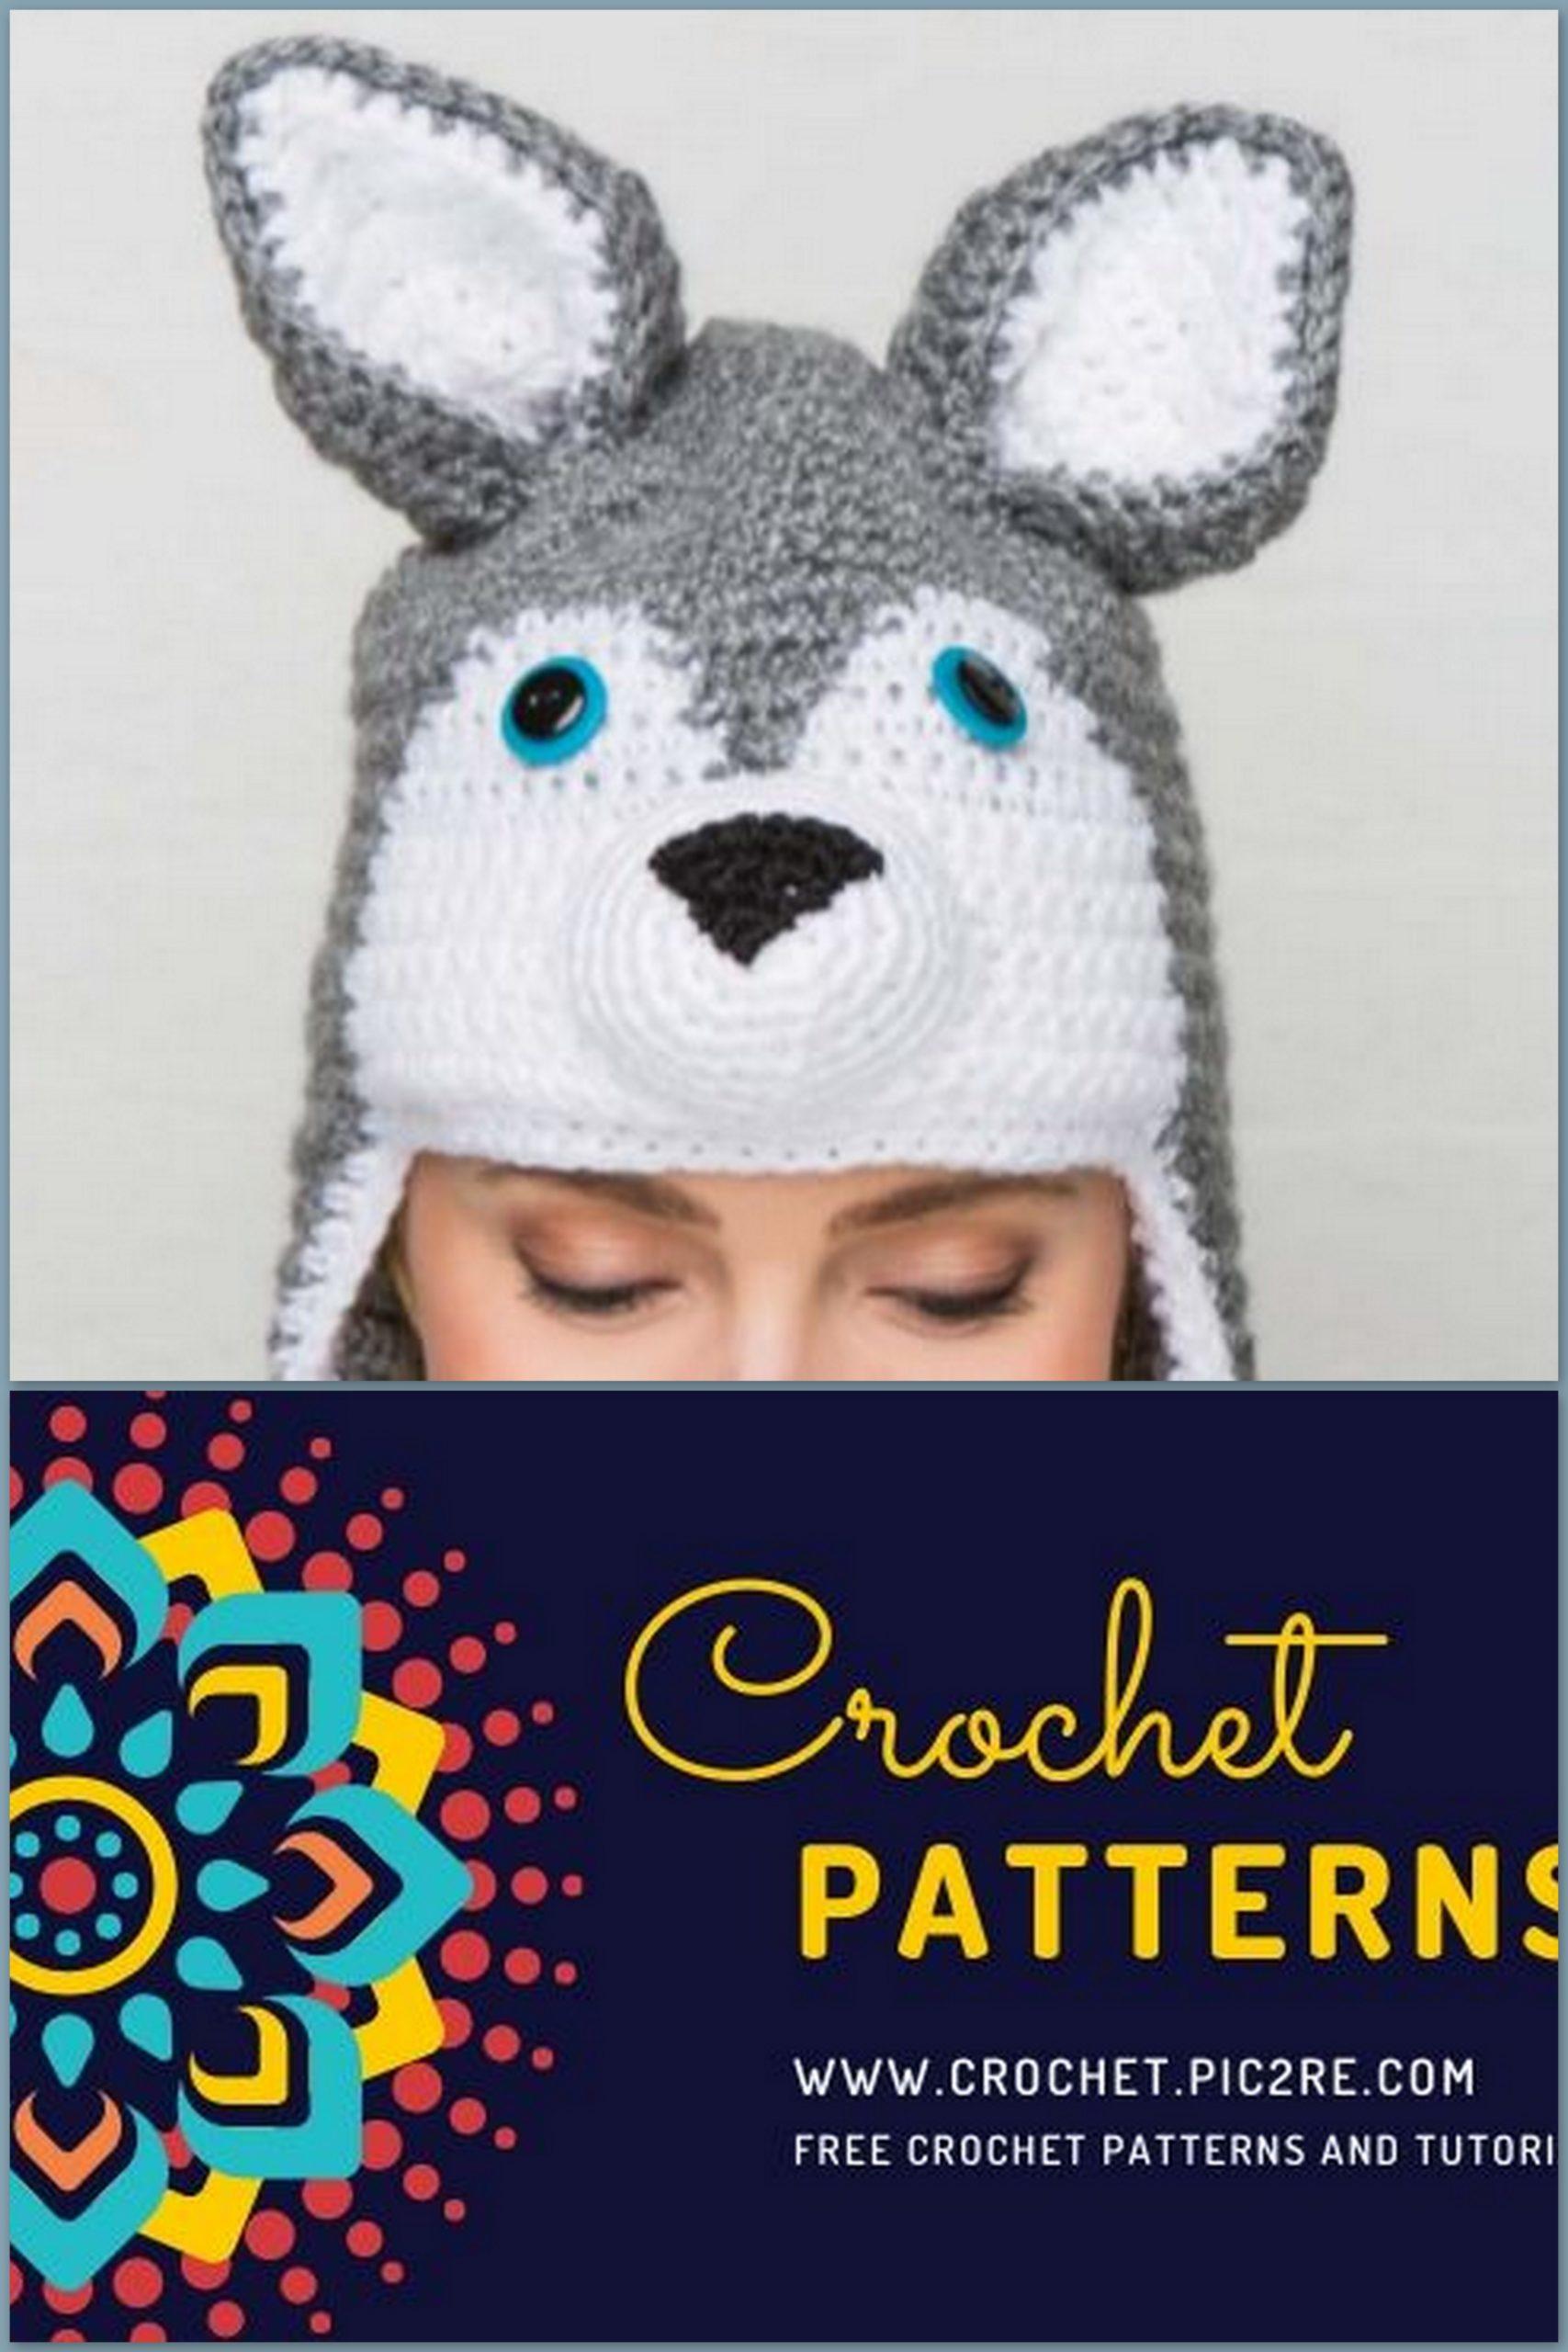 Crochet Small Amigurumi Siberian Husky Dog Part 1 of 2 DIY Video ... | 2560x1707